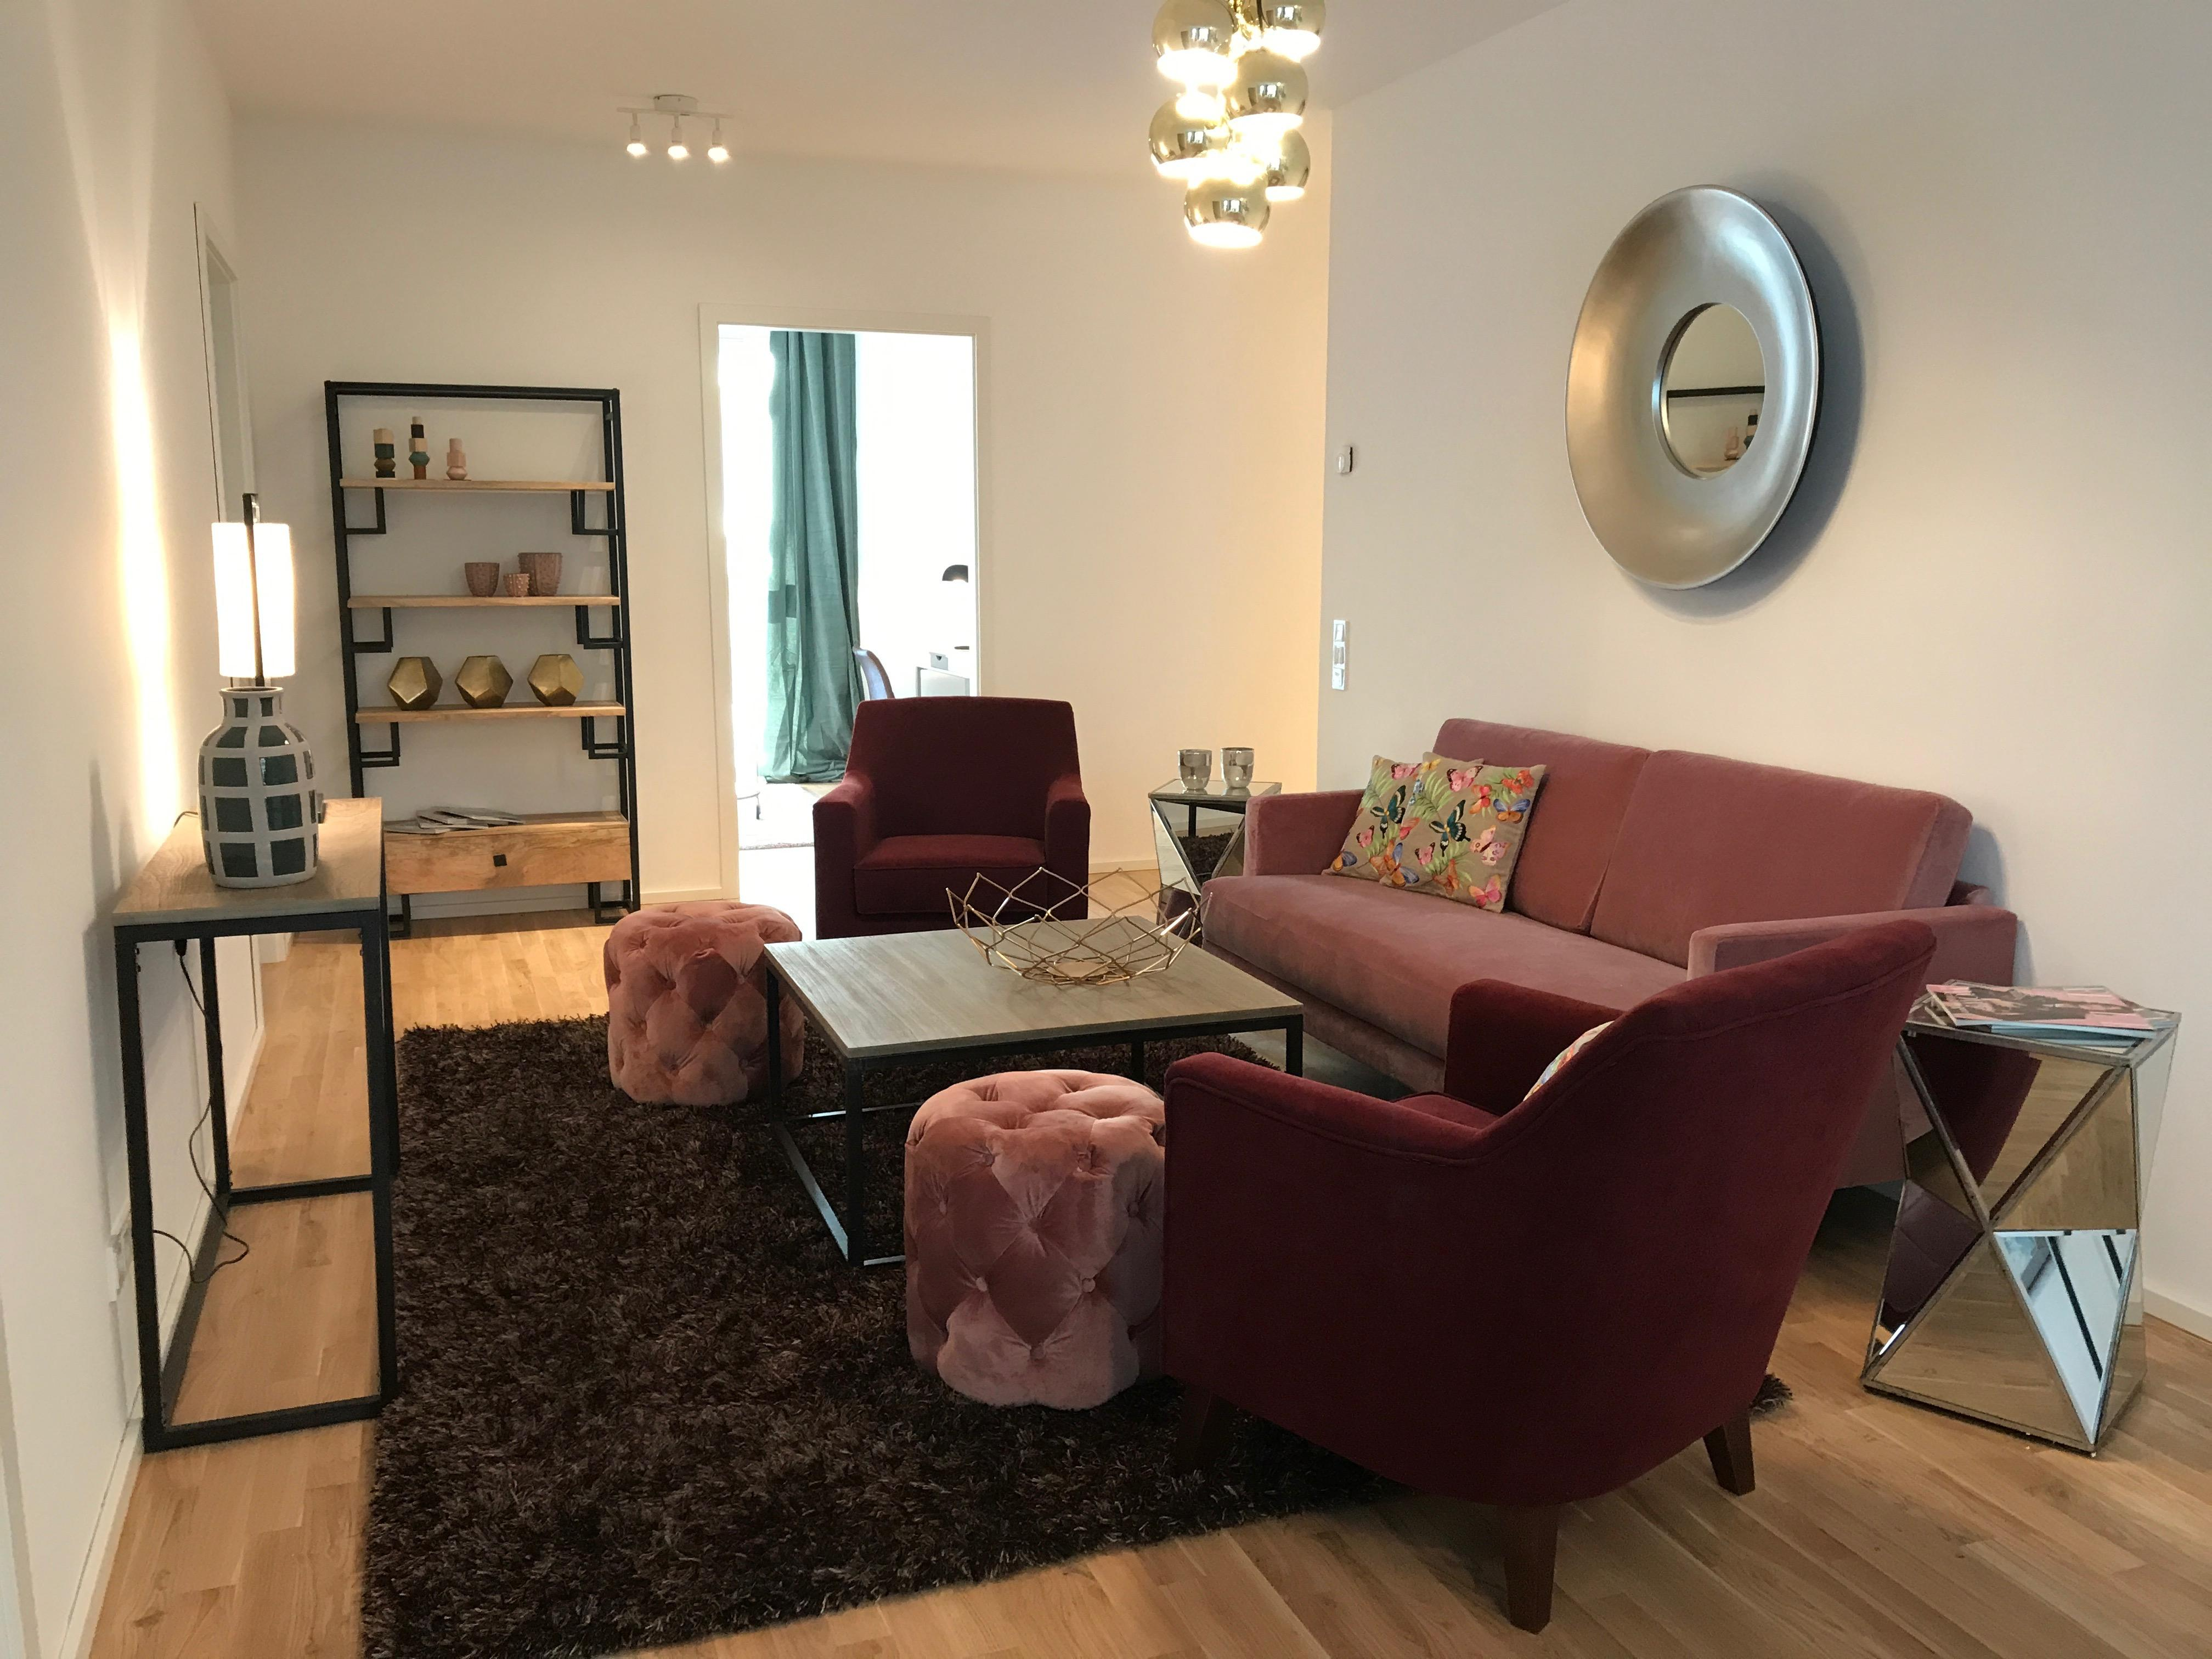 Wohnzimmer Sofa Sessel Hocker Pouf Sofa C Miracle